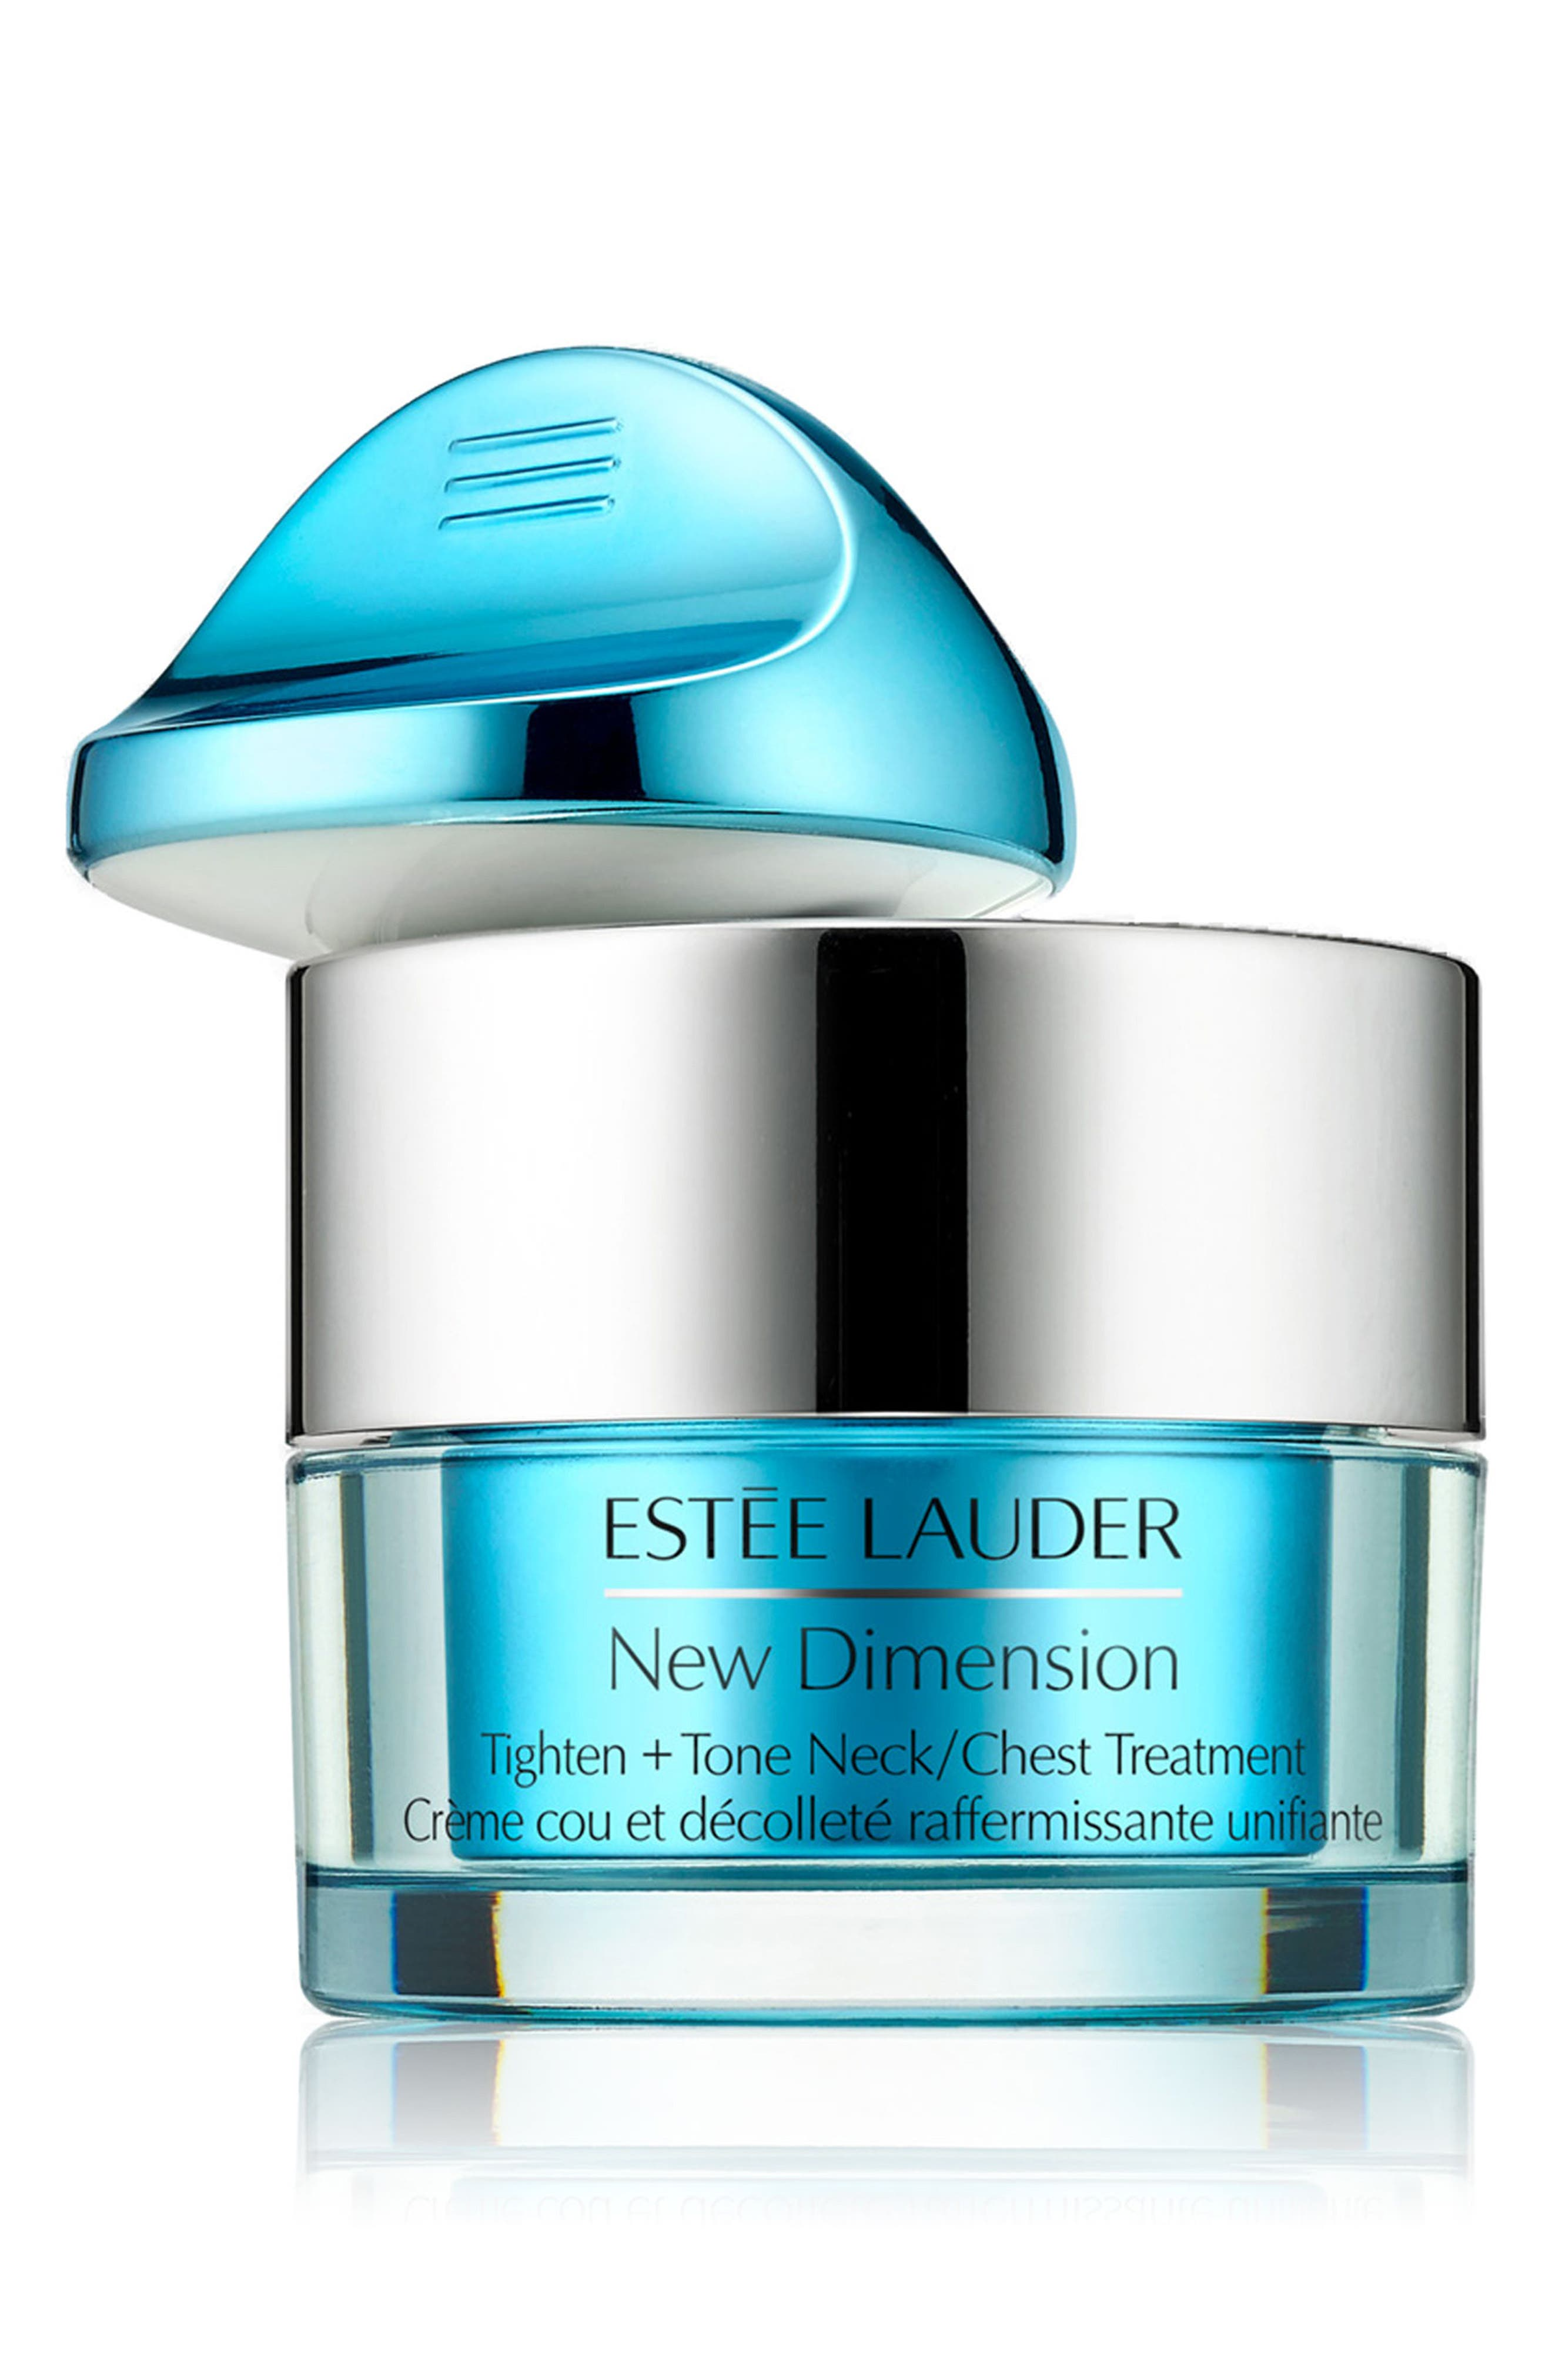 'New Dimension' Tighten + Tone Neck & Chest Treatment,                             Alternate thumbnail 2, color,                             000